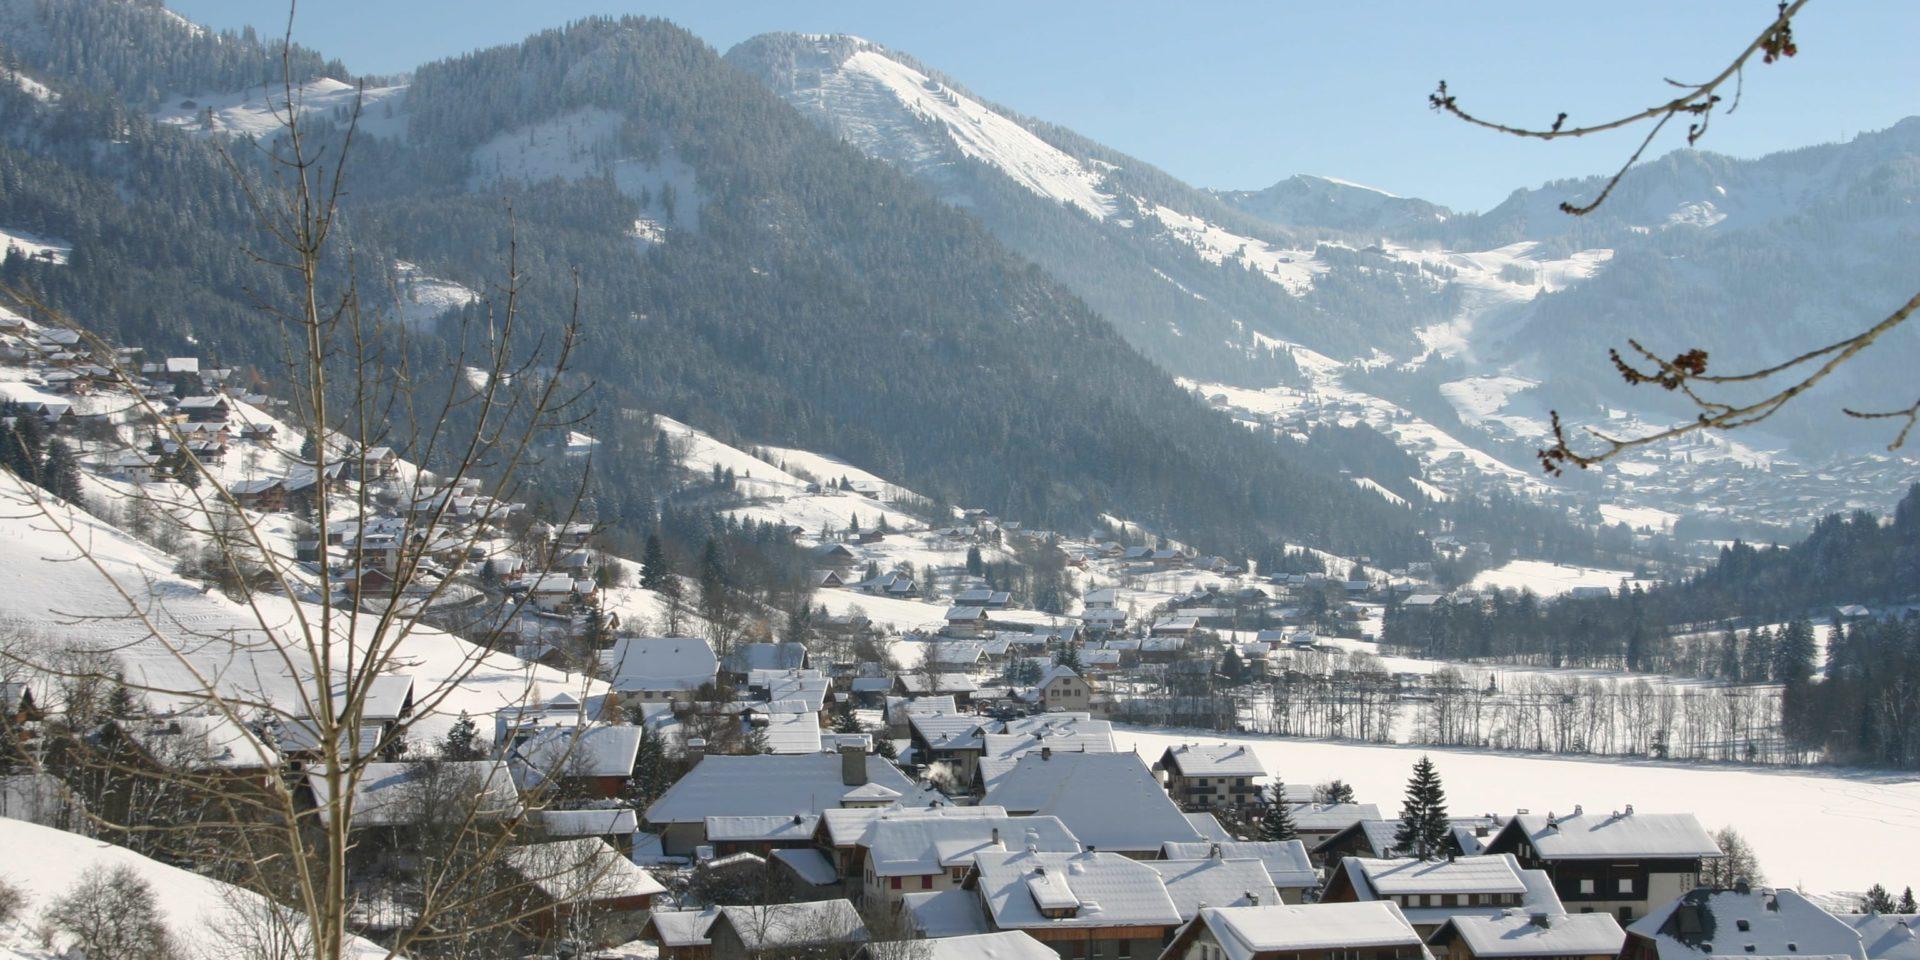 La Chapelle d'Abondance Les Portes du Soleil Frankrijk wintersport skivakantie luxe dorp bomen bergen sneeuw